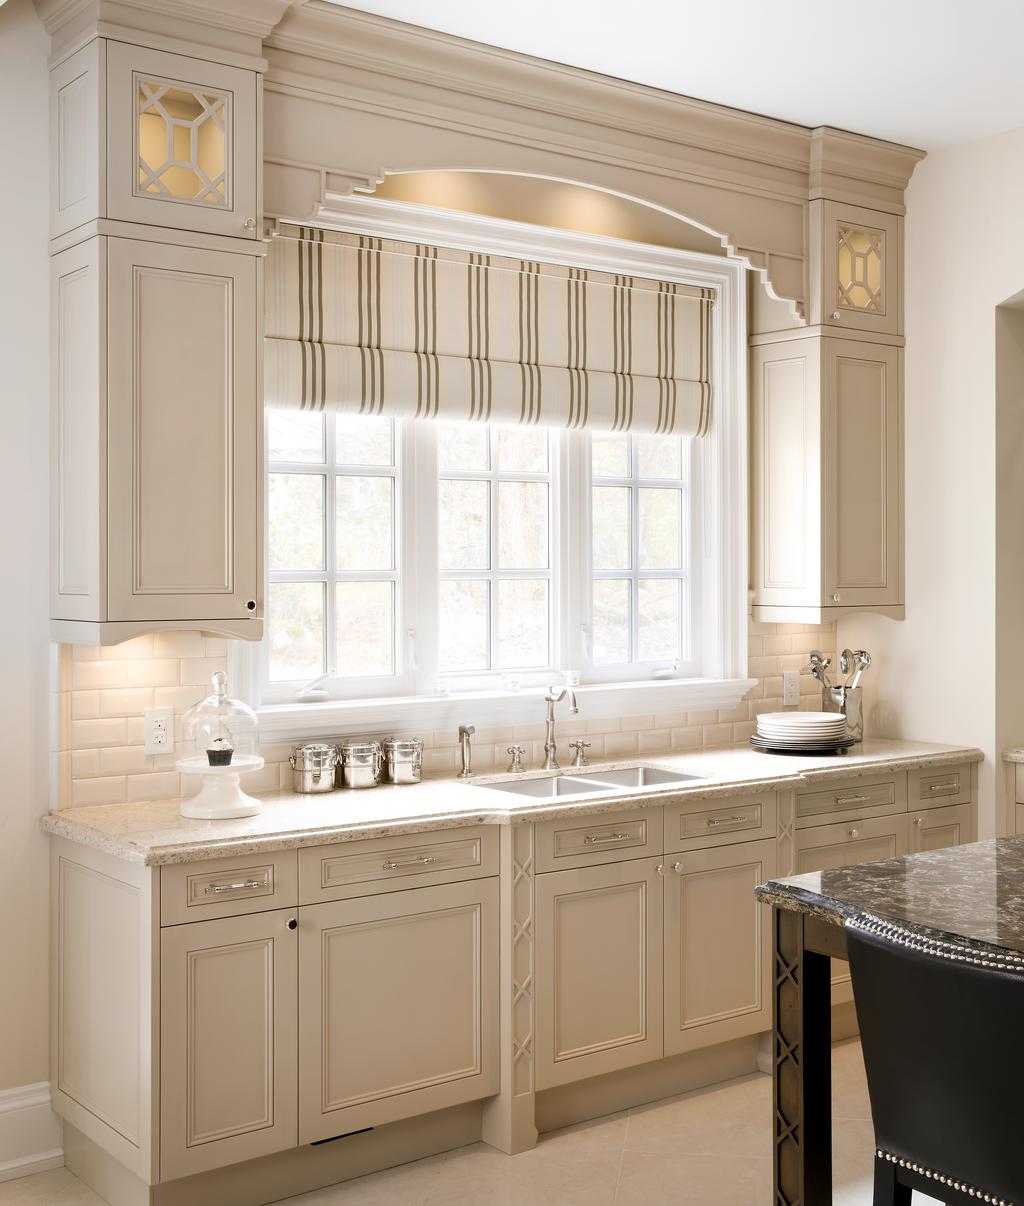 Kitchen window ledge  photos of model homes kitchens  kitchen prep area  custom model